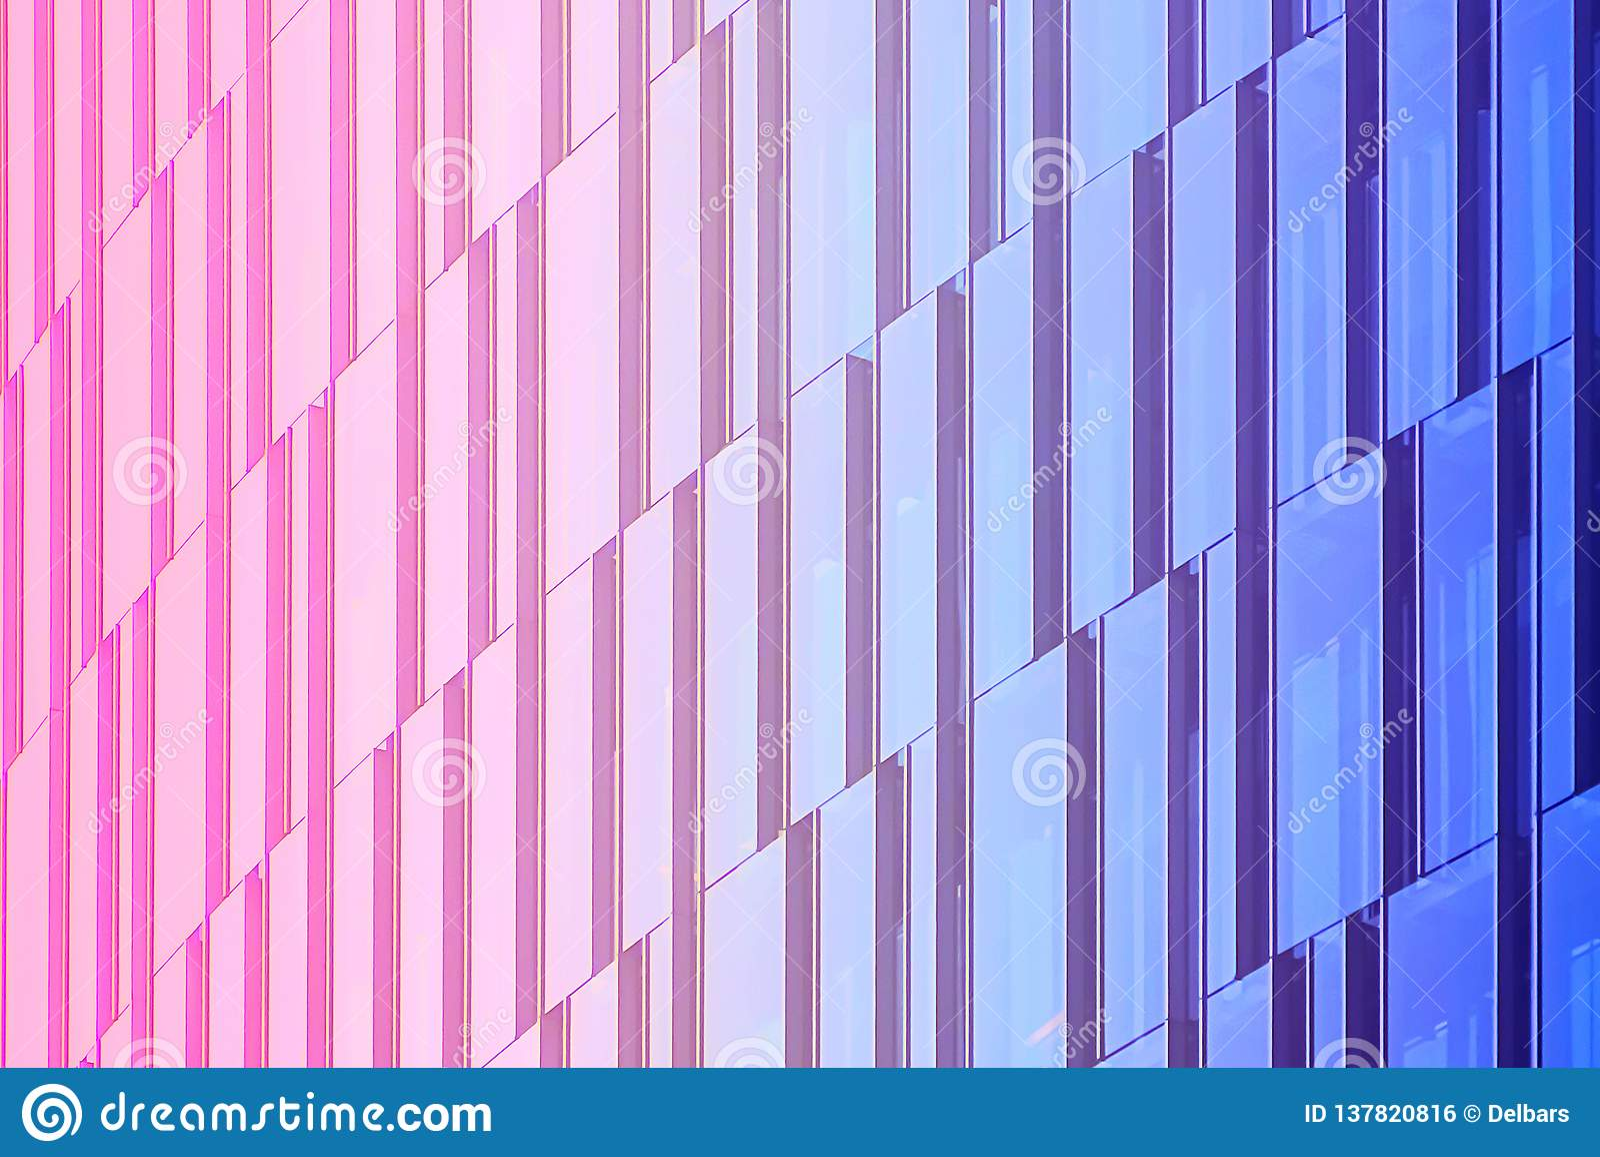 Geometric architectural urban background. The glass facade of a skyscraper.